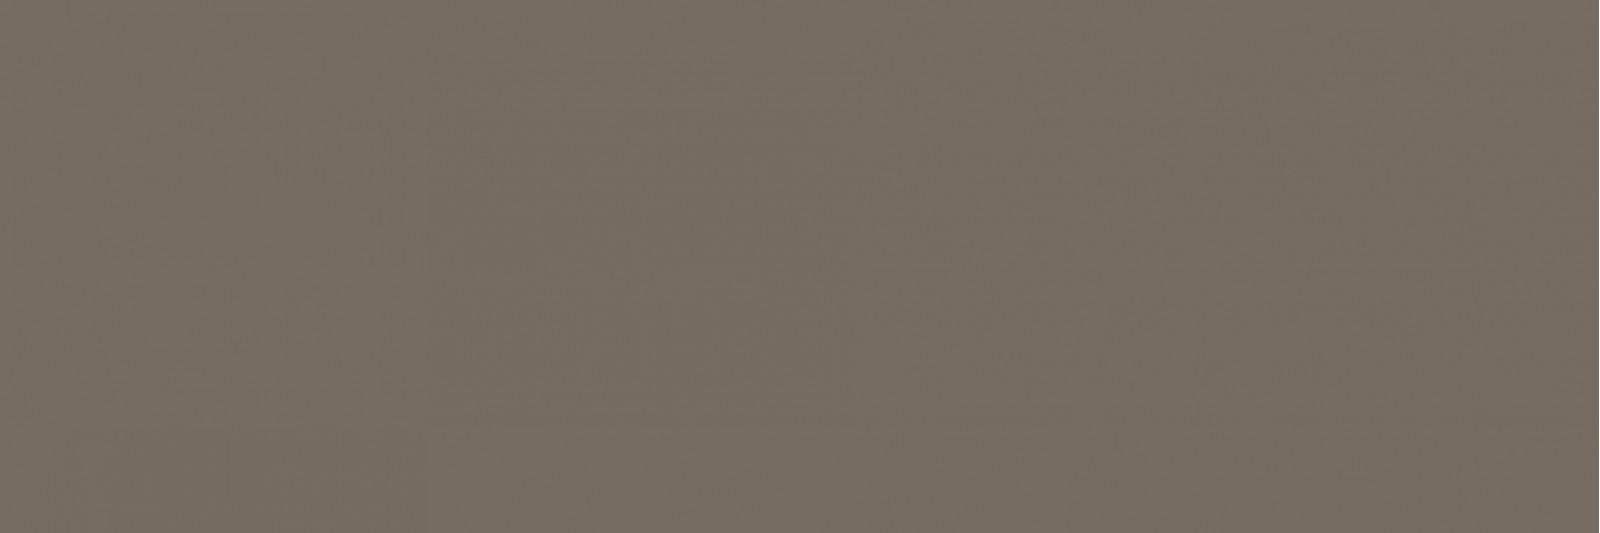 Стенни плочки Colorplay Taupe 30x90